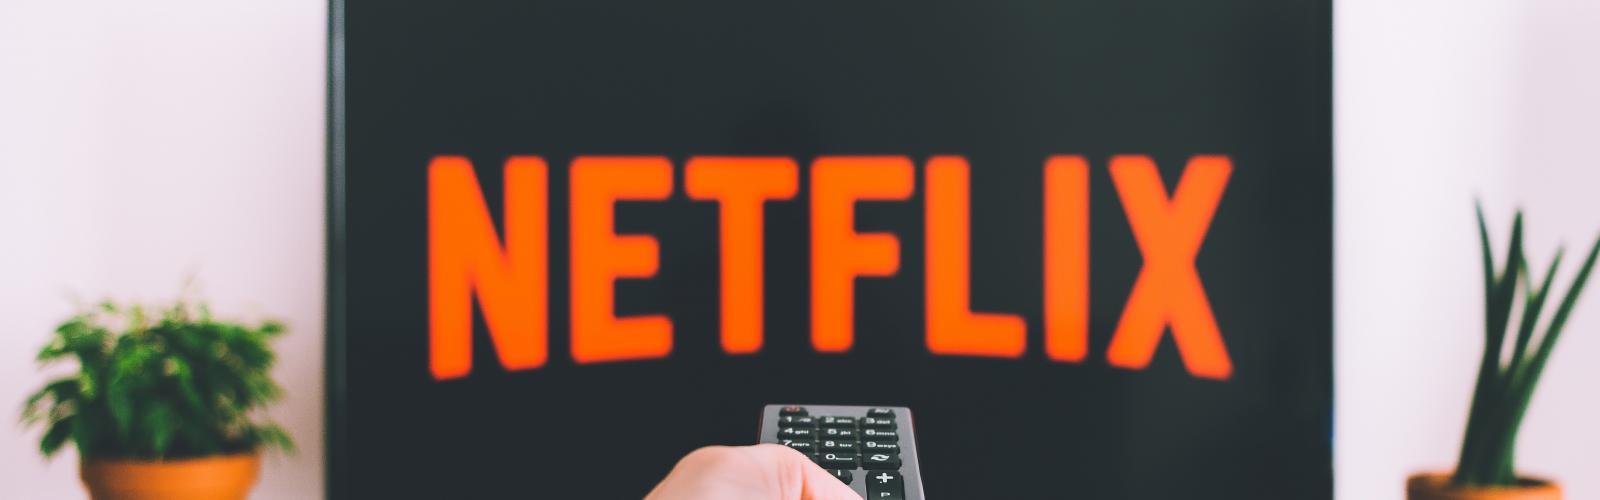 Localization Success Story: Netflix   Lingual Consultancy